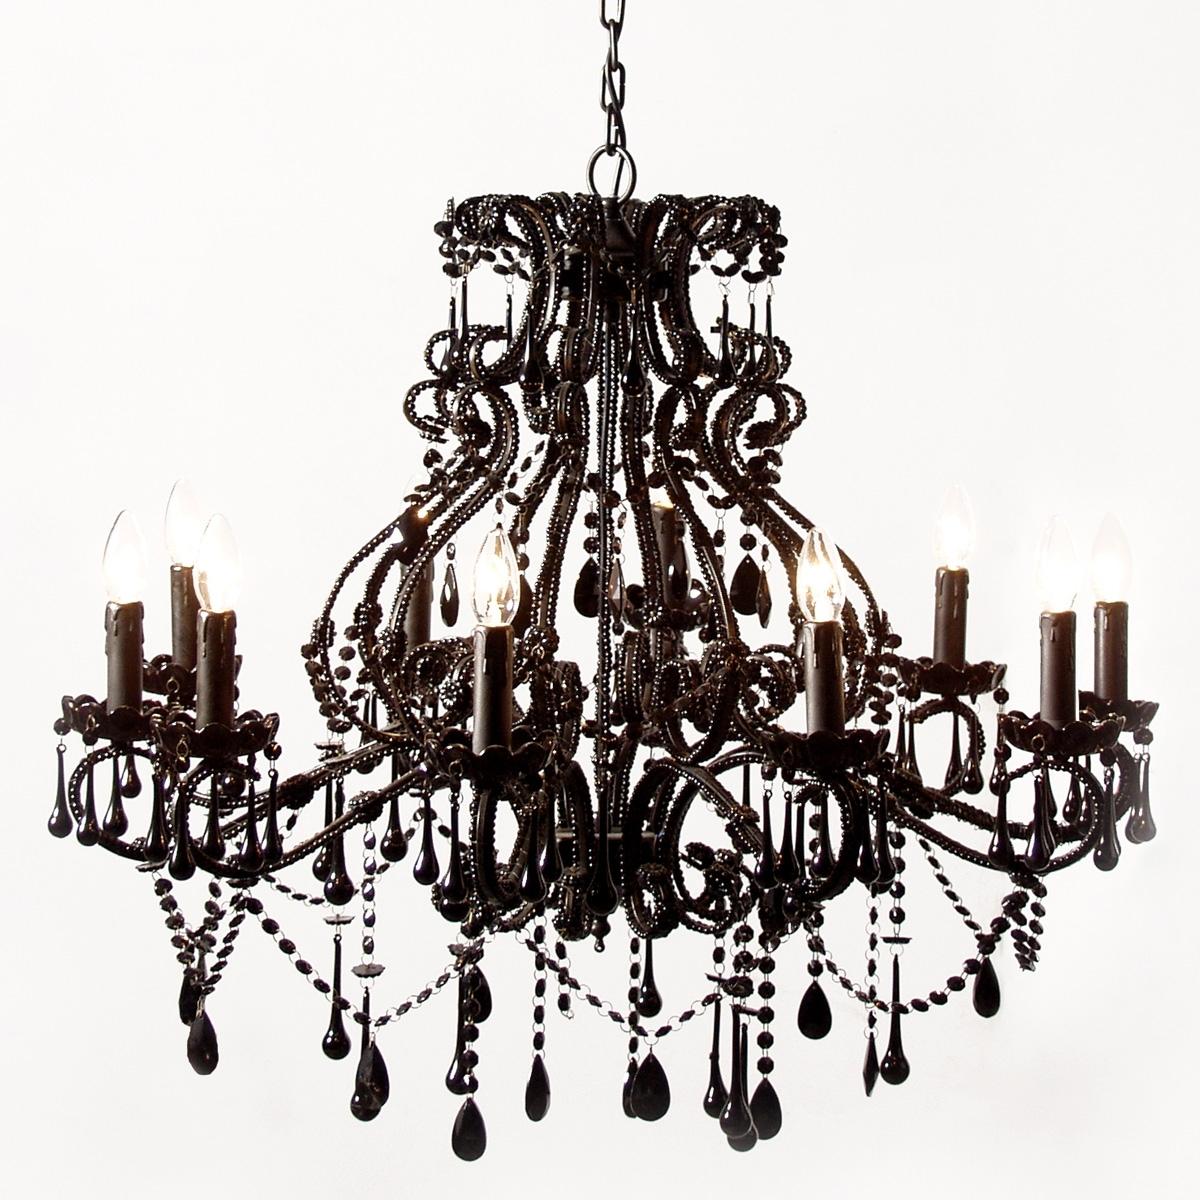 Favorite Vintage Black Chandelier Within Vintage Black Chandelier For Bedroom Image 4 – Howiezine (View 5 of 20)